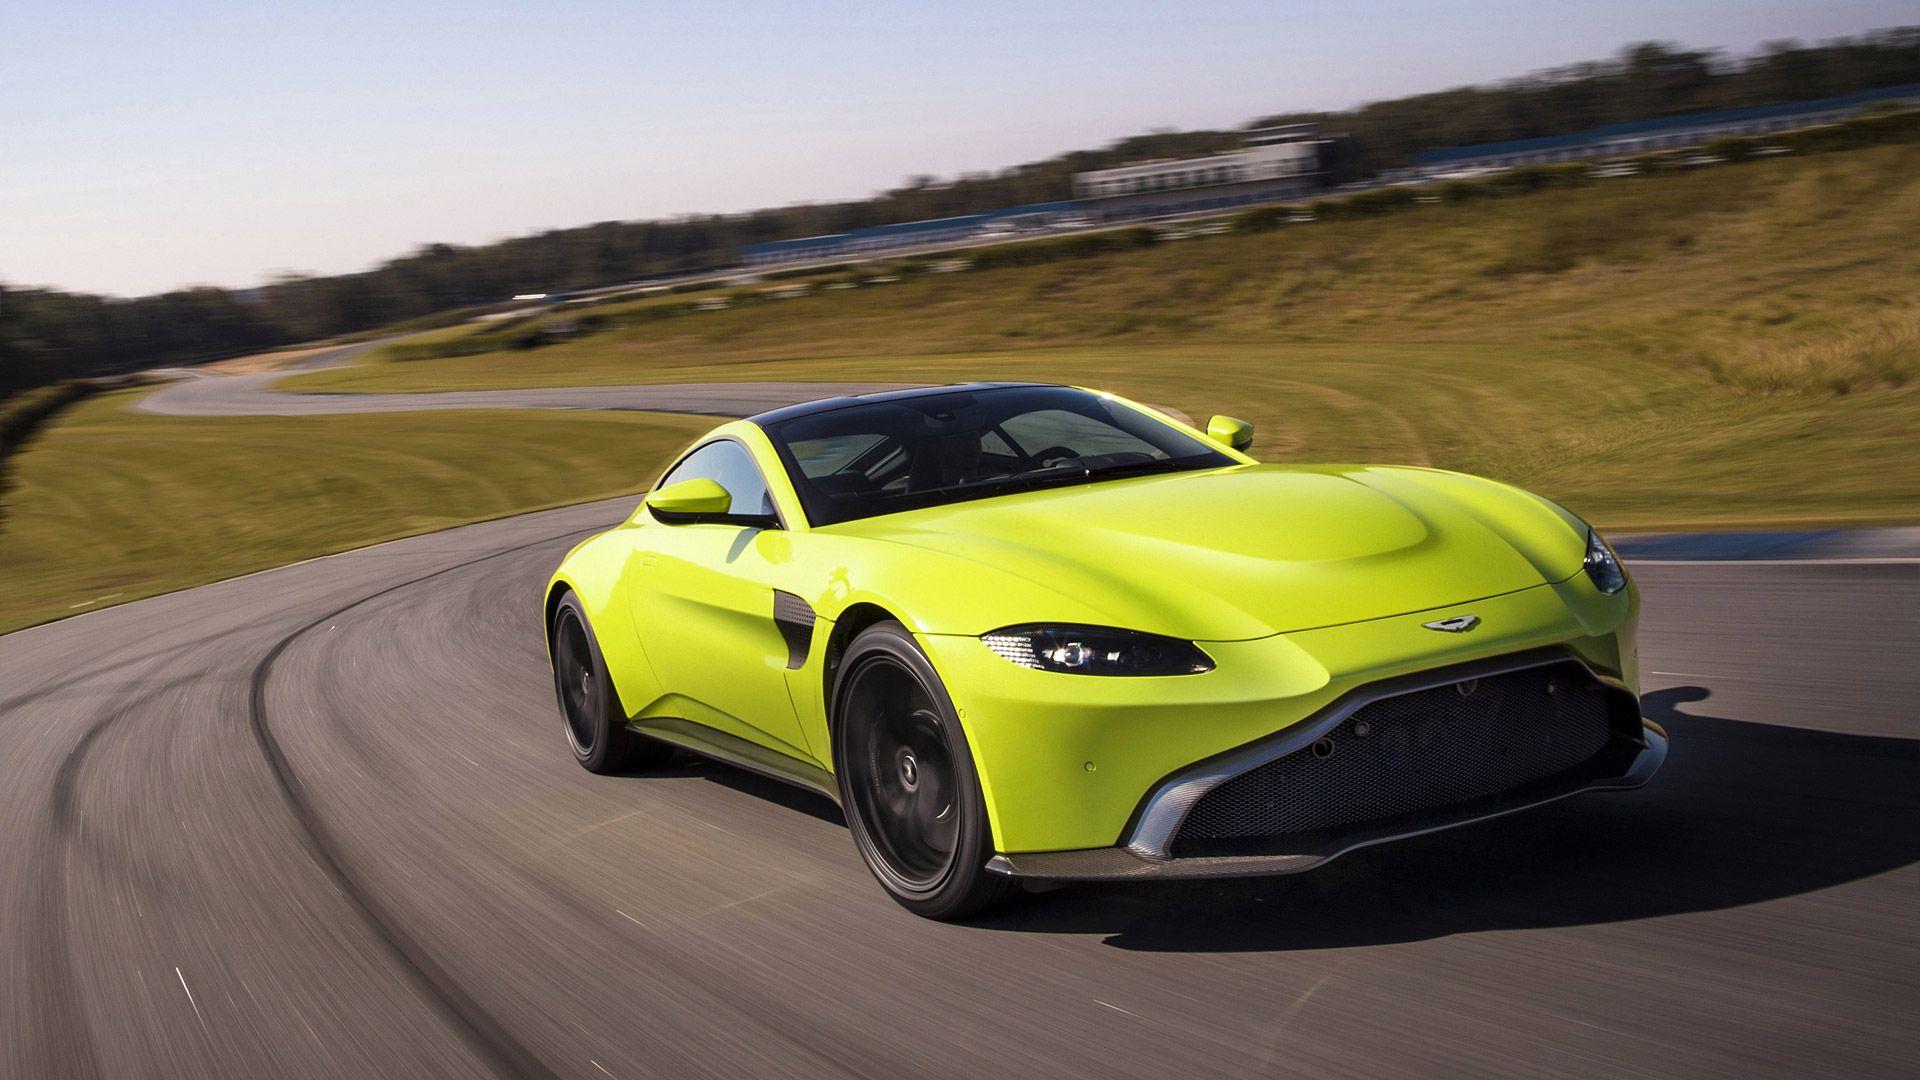 Aston Martin Vantage Hd Wallpapers Wallpaper Cave